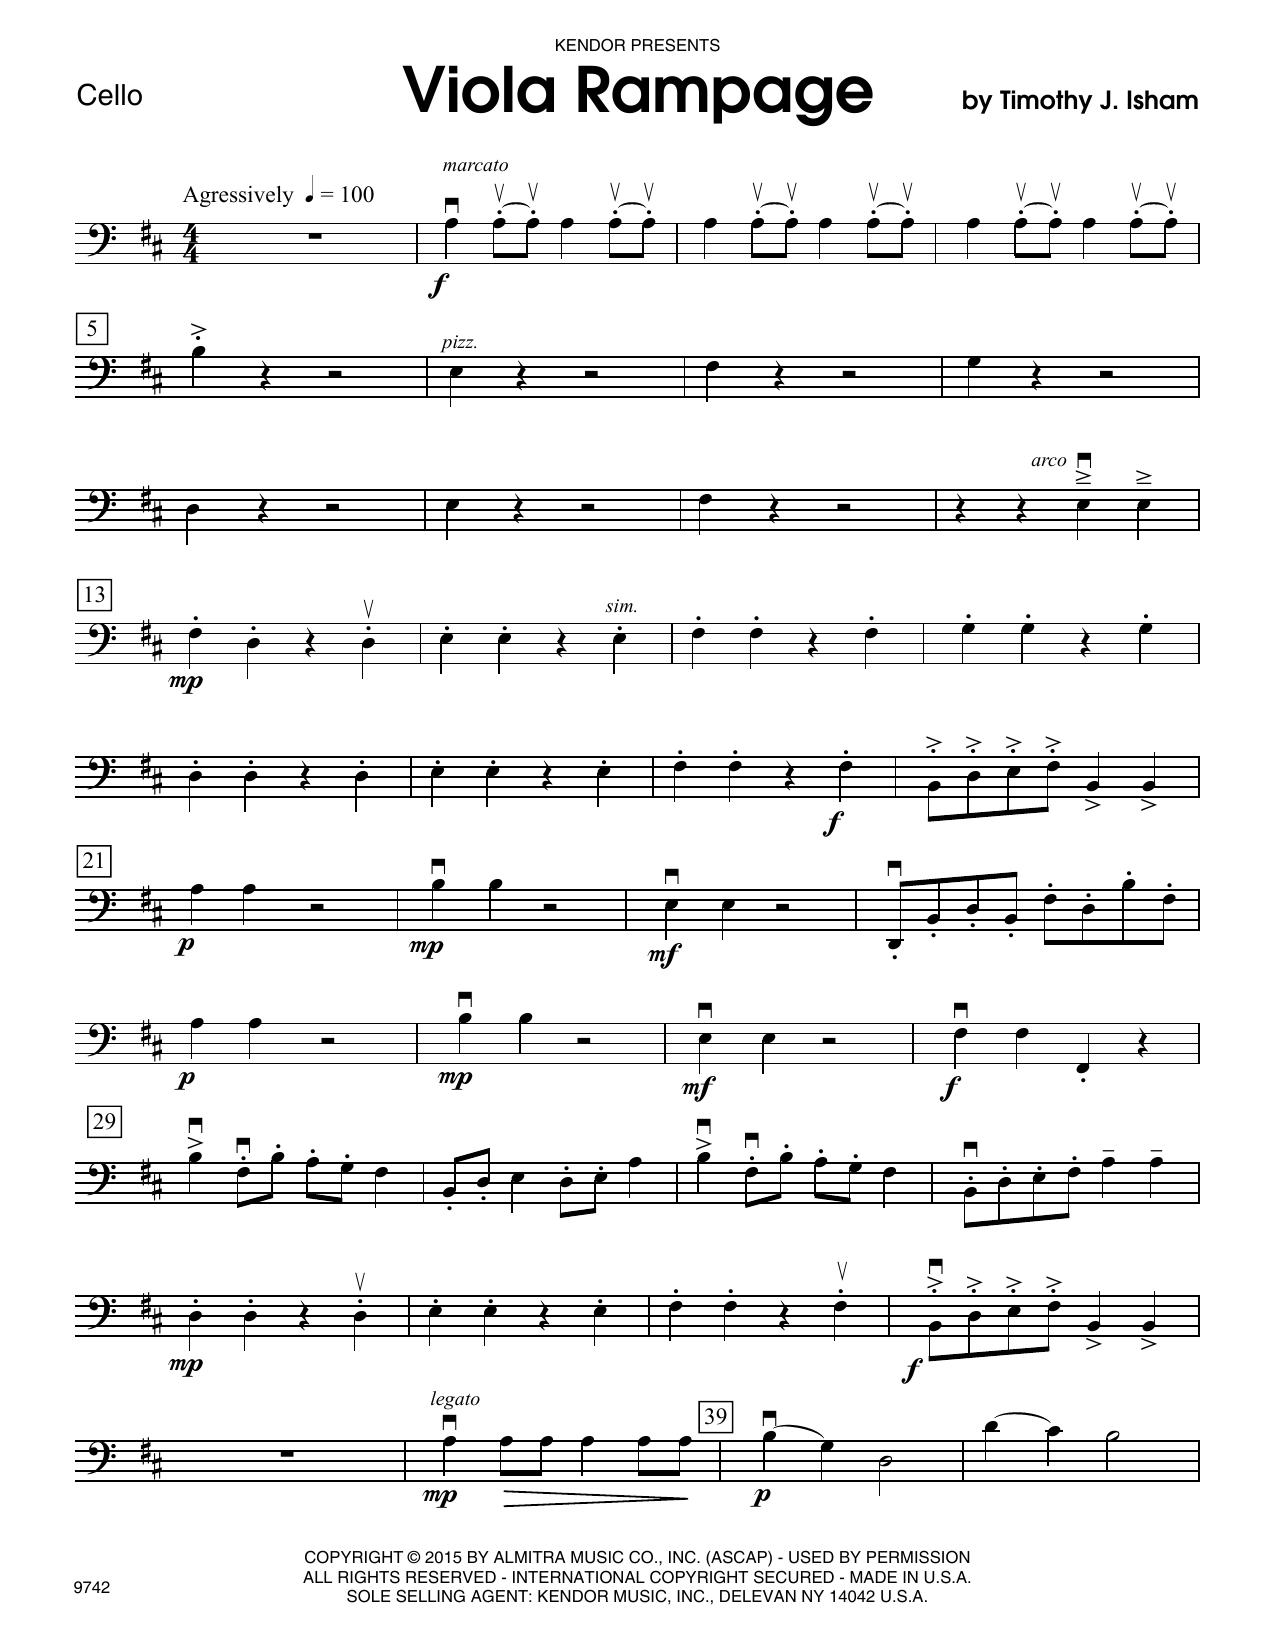 Viola Rampage - Cello